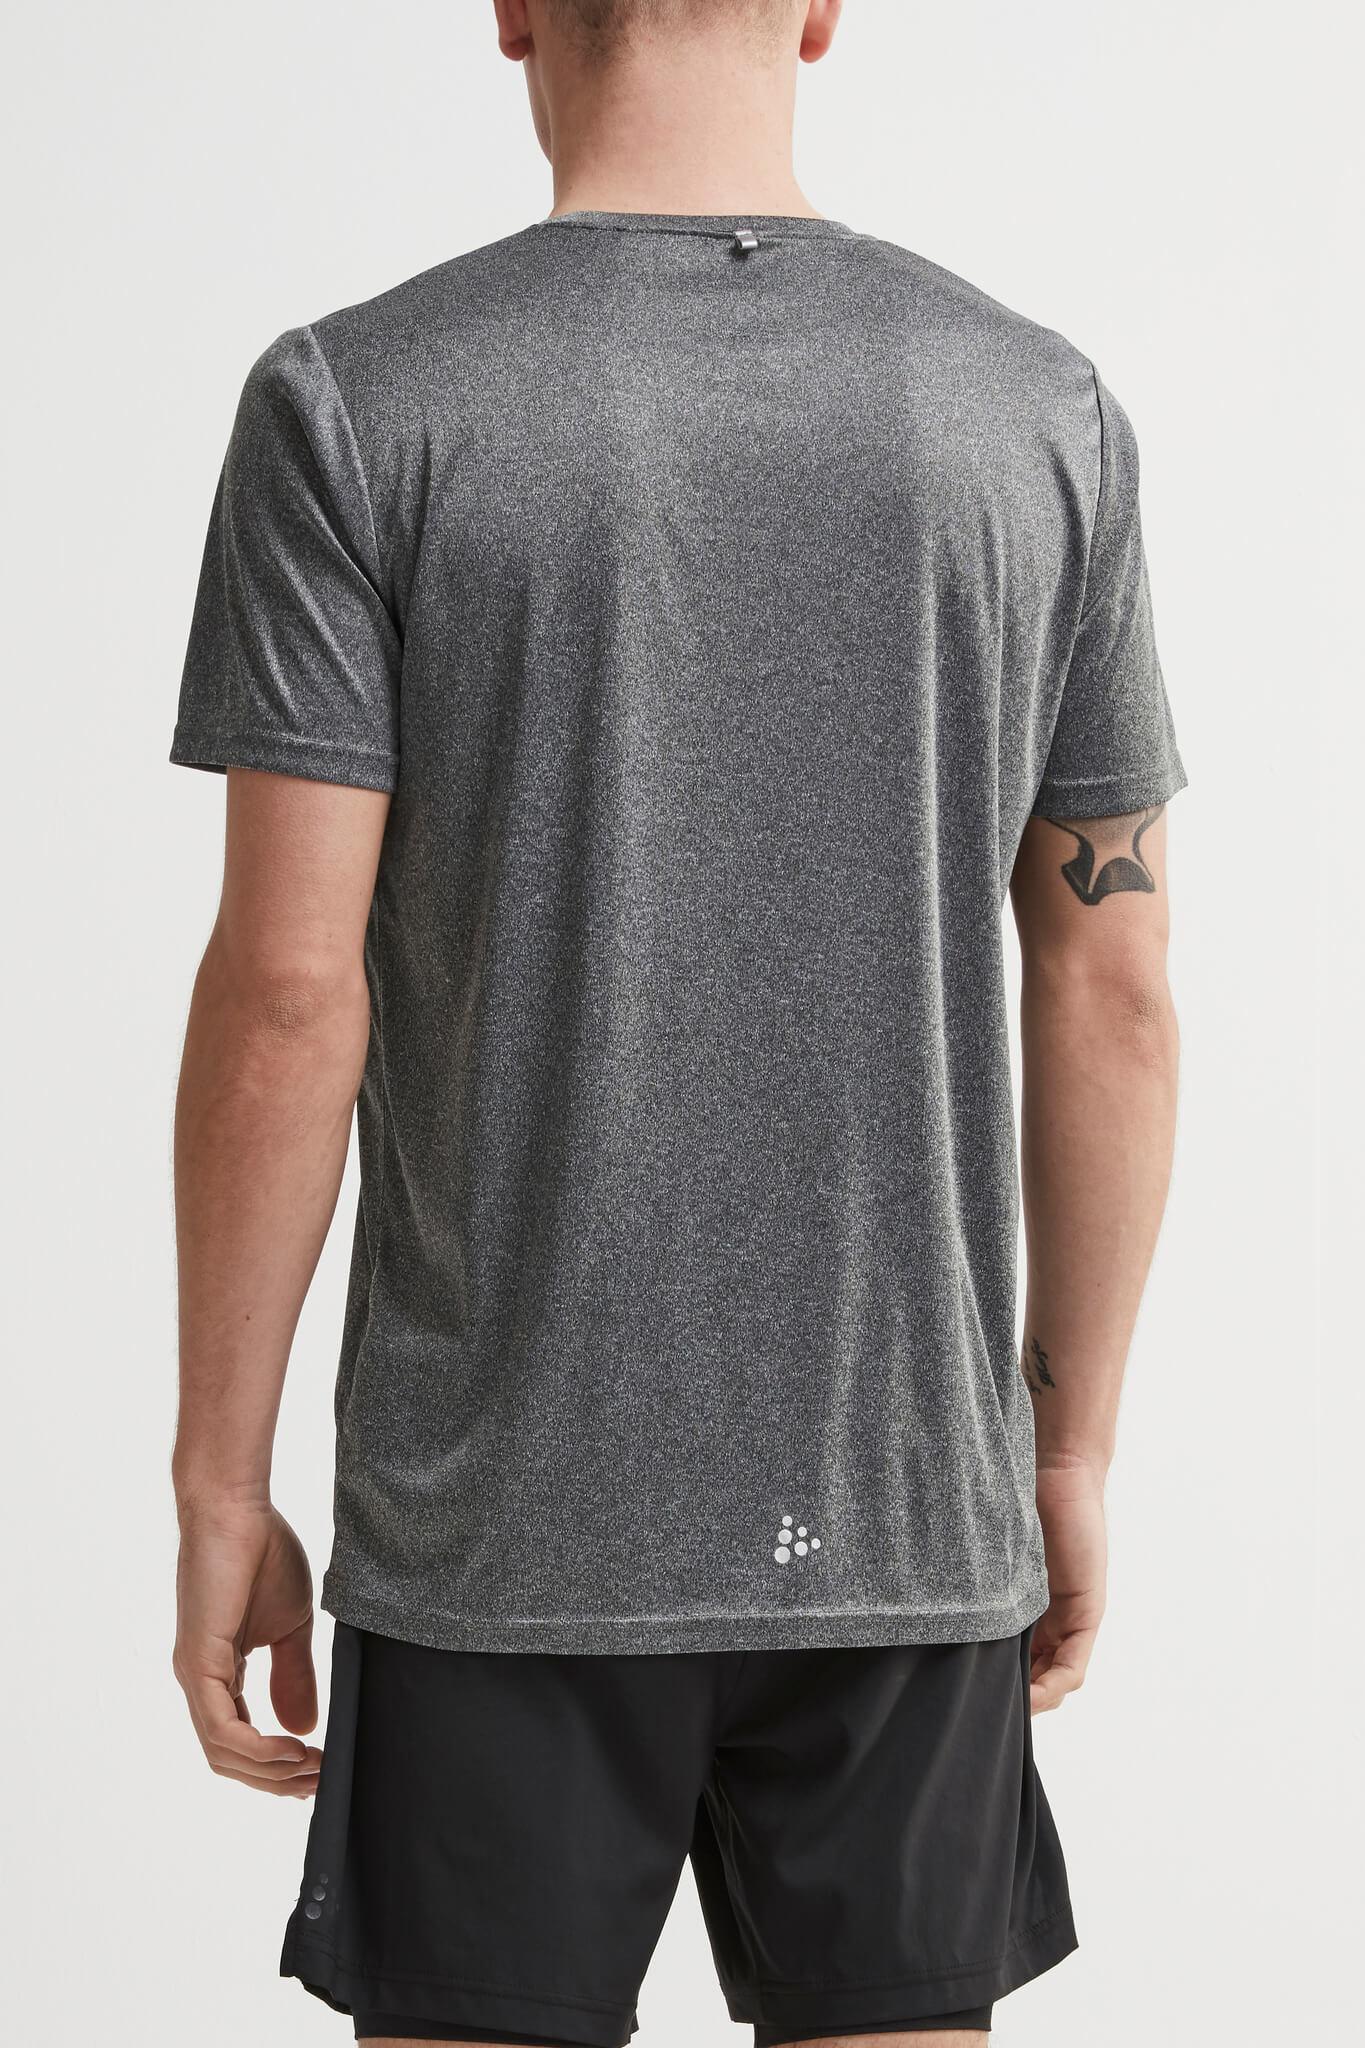 Craft Eaze SS Graghic футболка спортивная мужская grey - 3